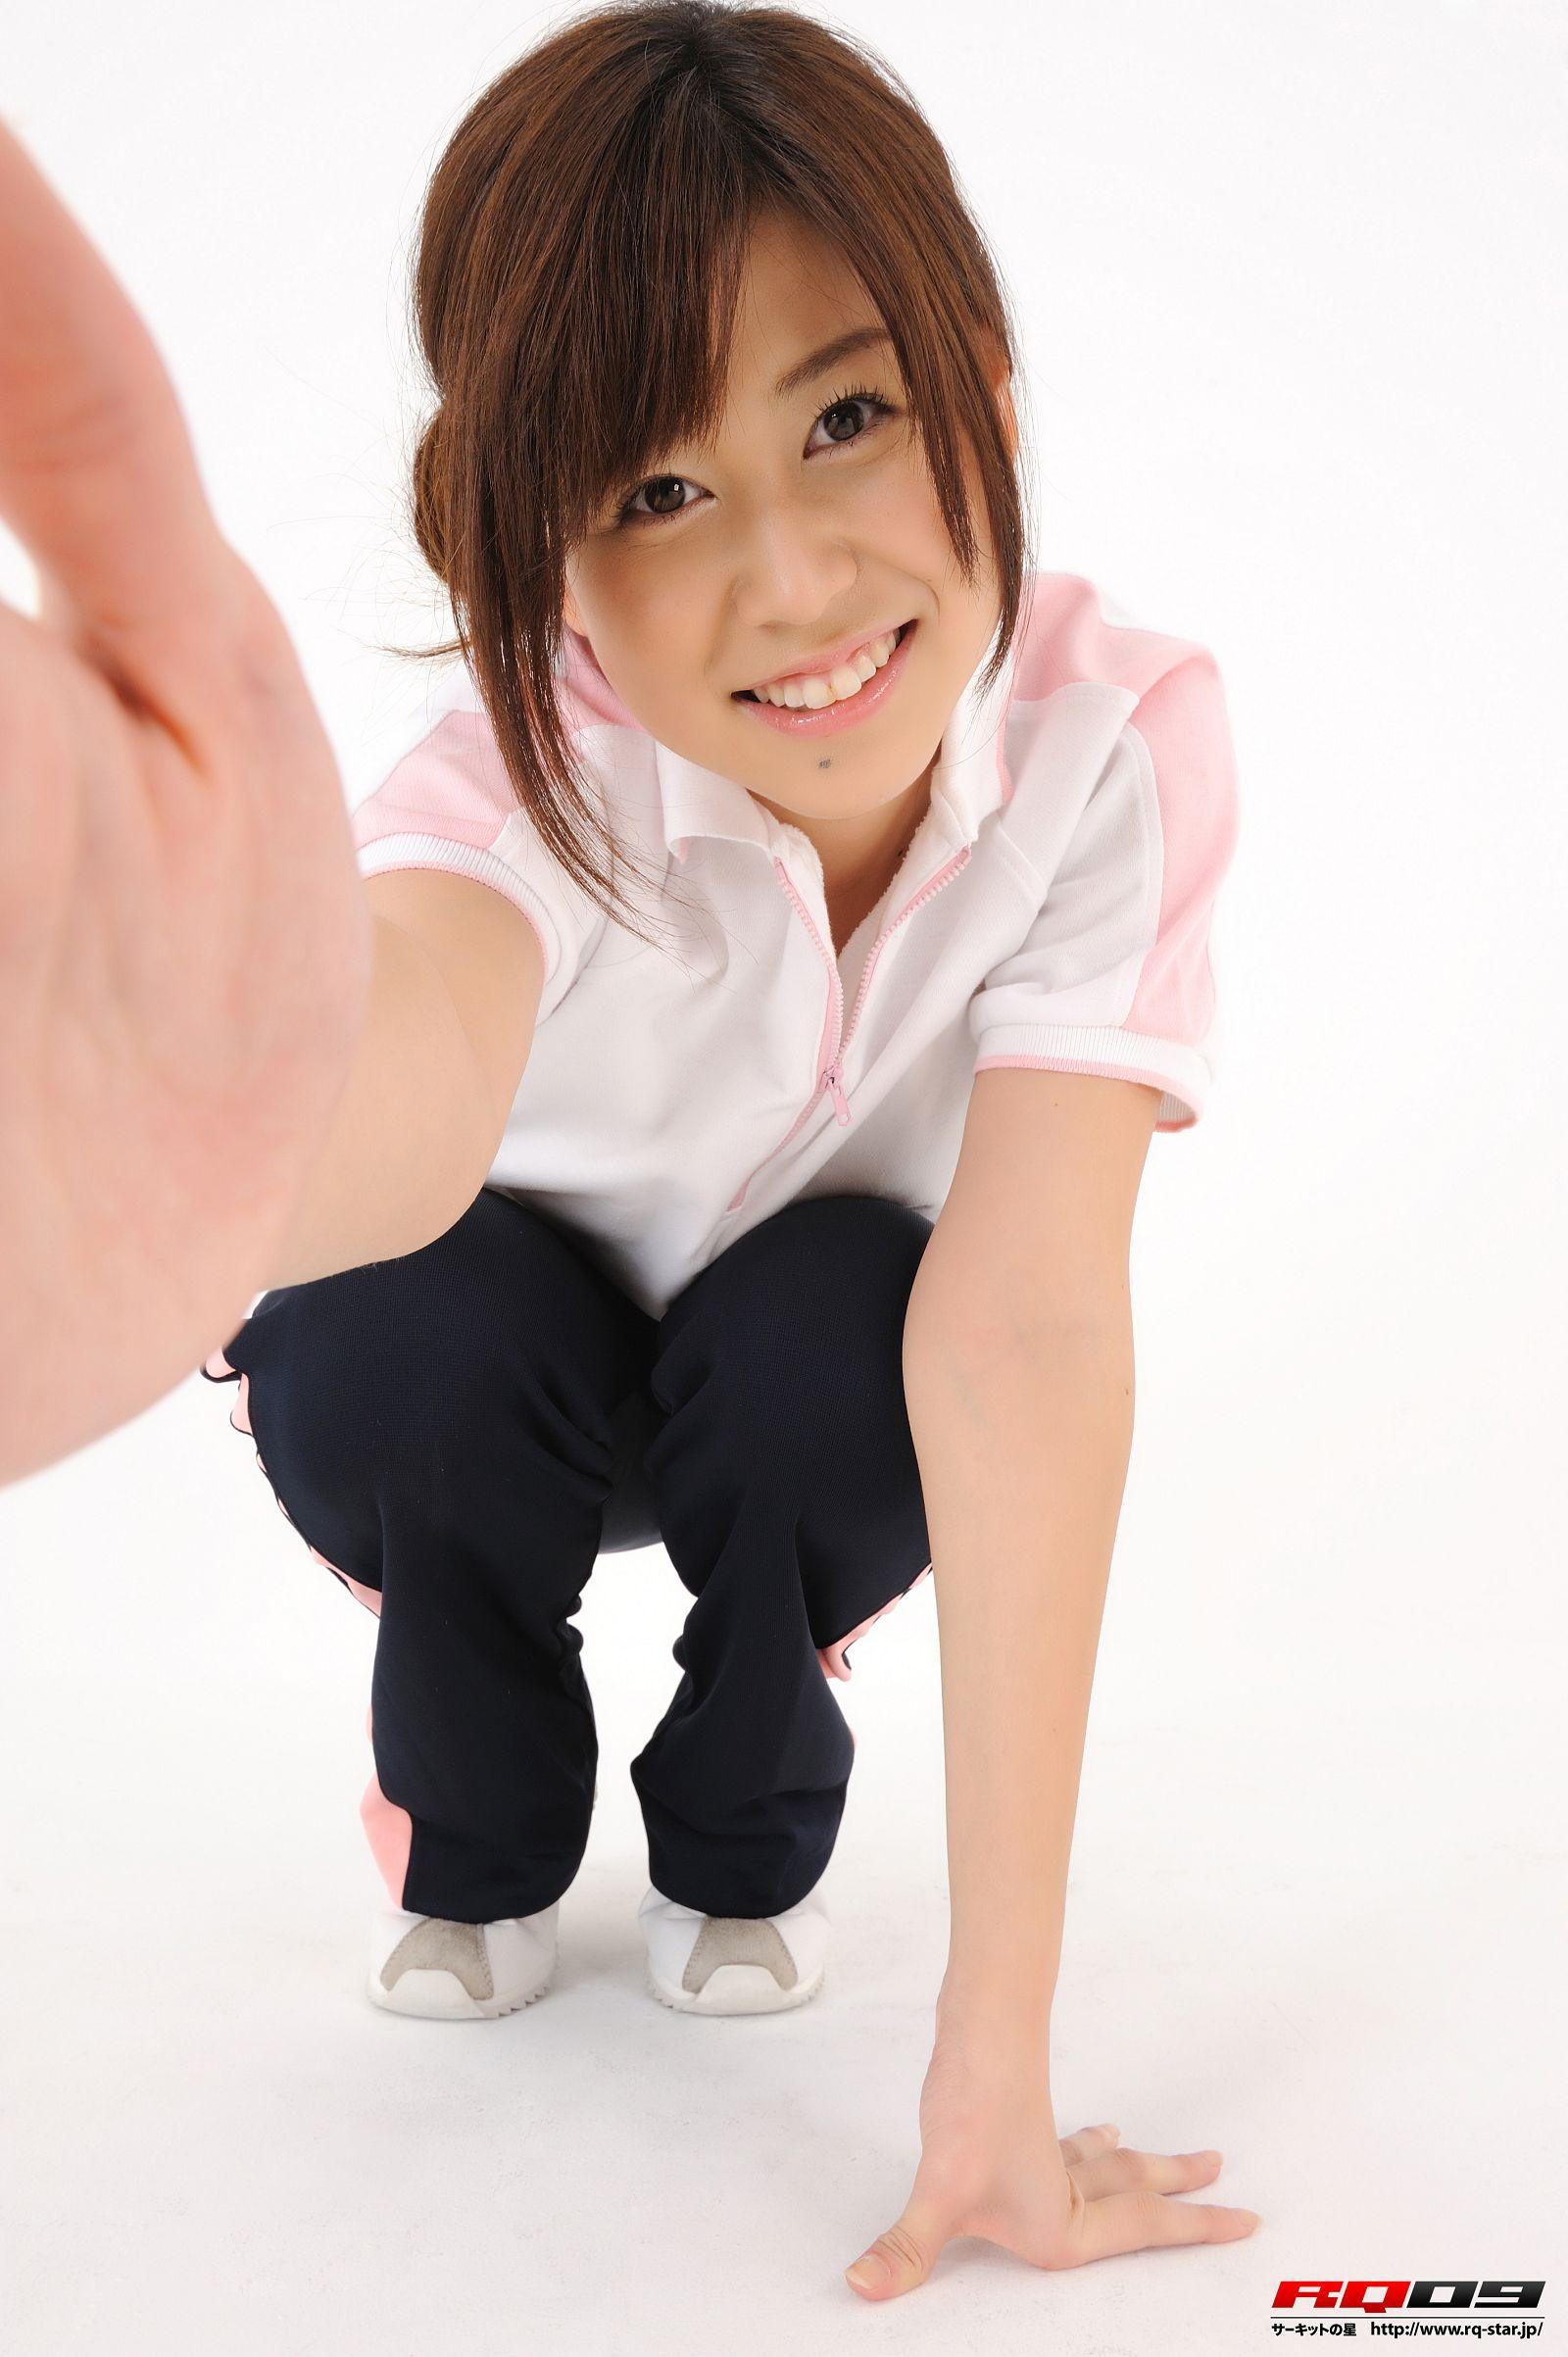 [RQ STAR美女] NO.0133 Airi Nagasaku 永作あいり Kindergartner[50P] RQ STAR 第3张